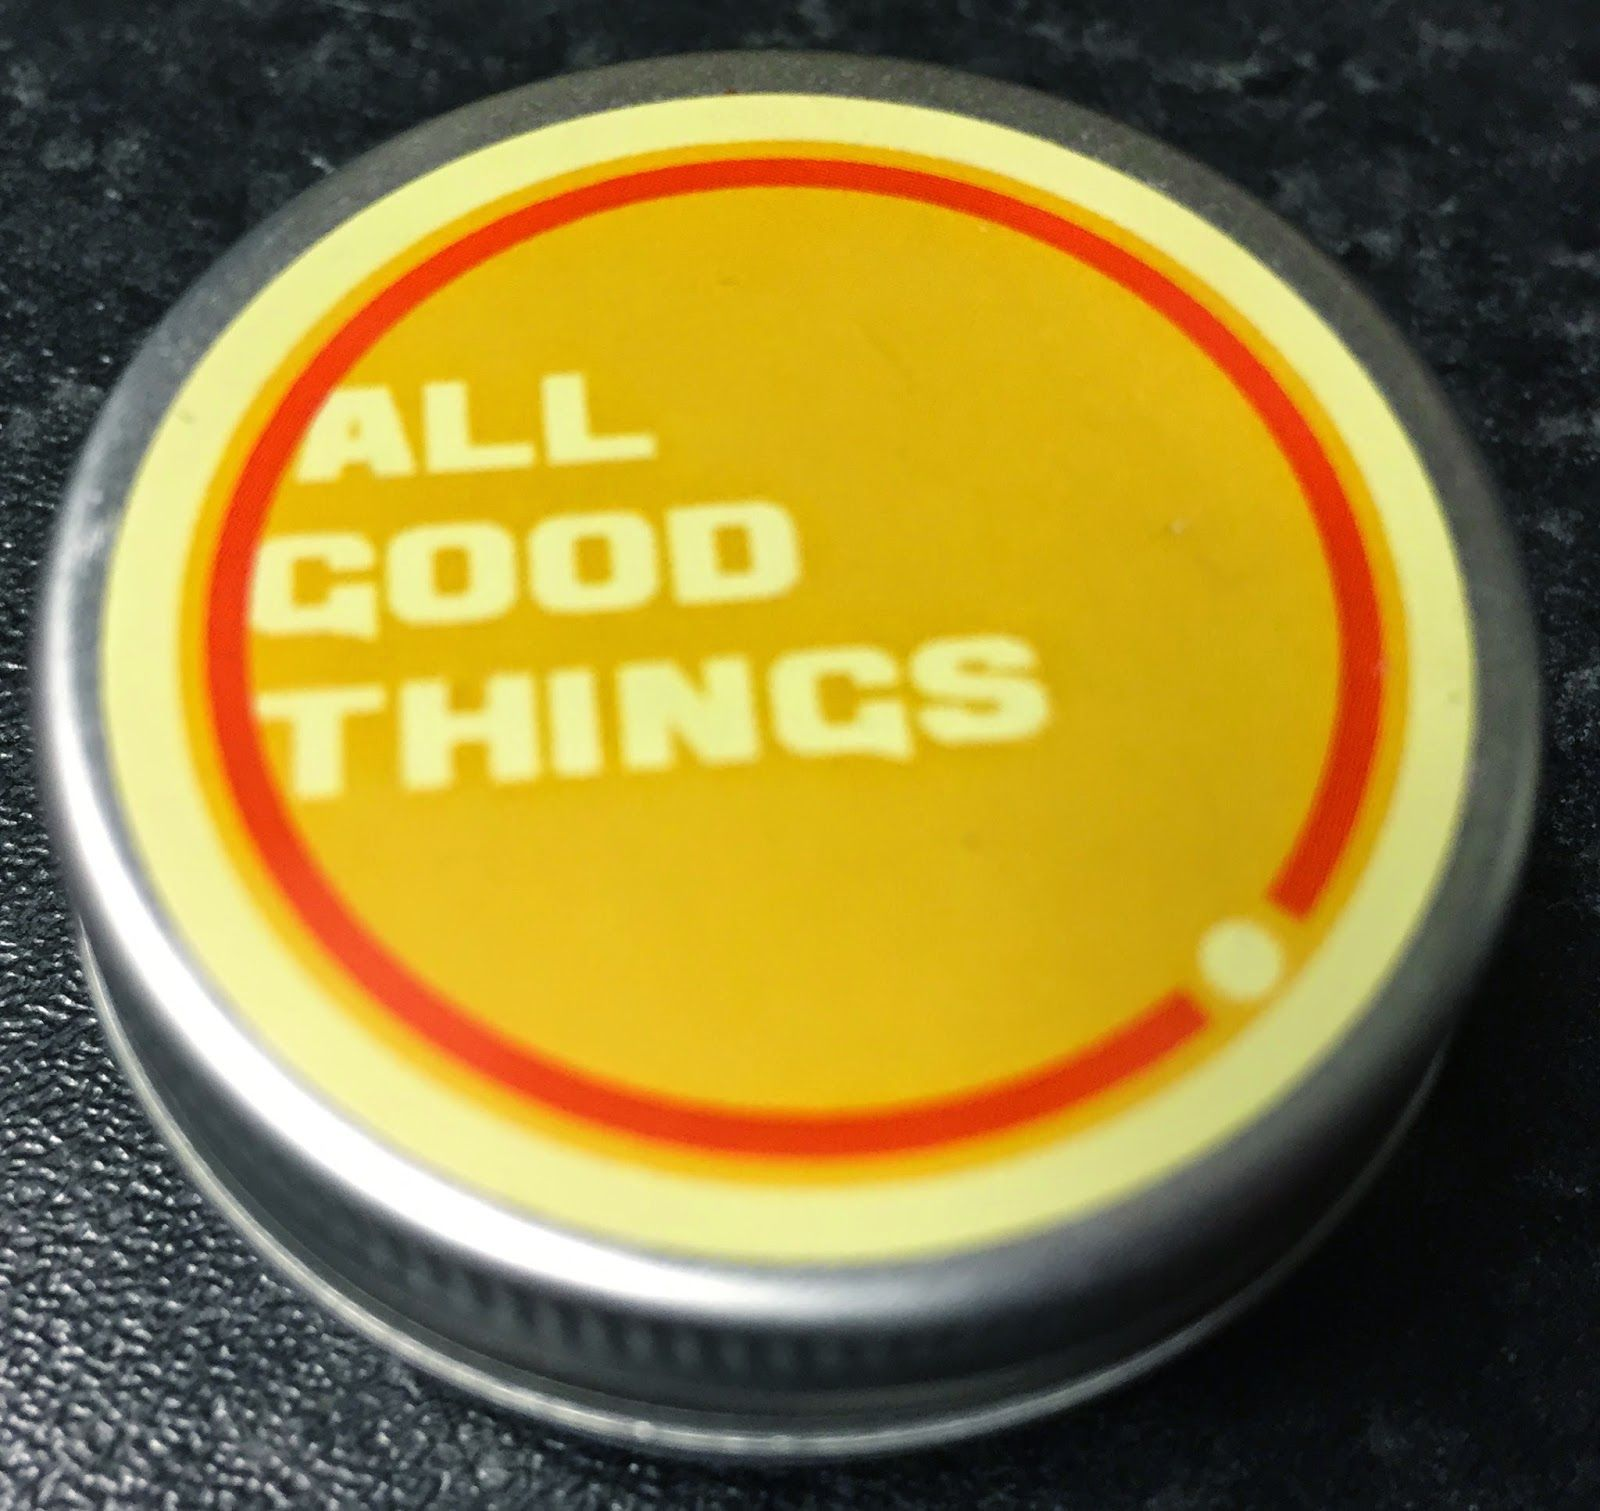 All Things Lush Uk All Good Things Solid Perfume My Favorite Lush